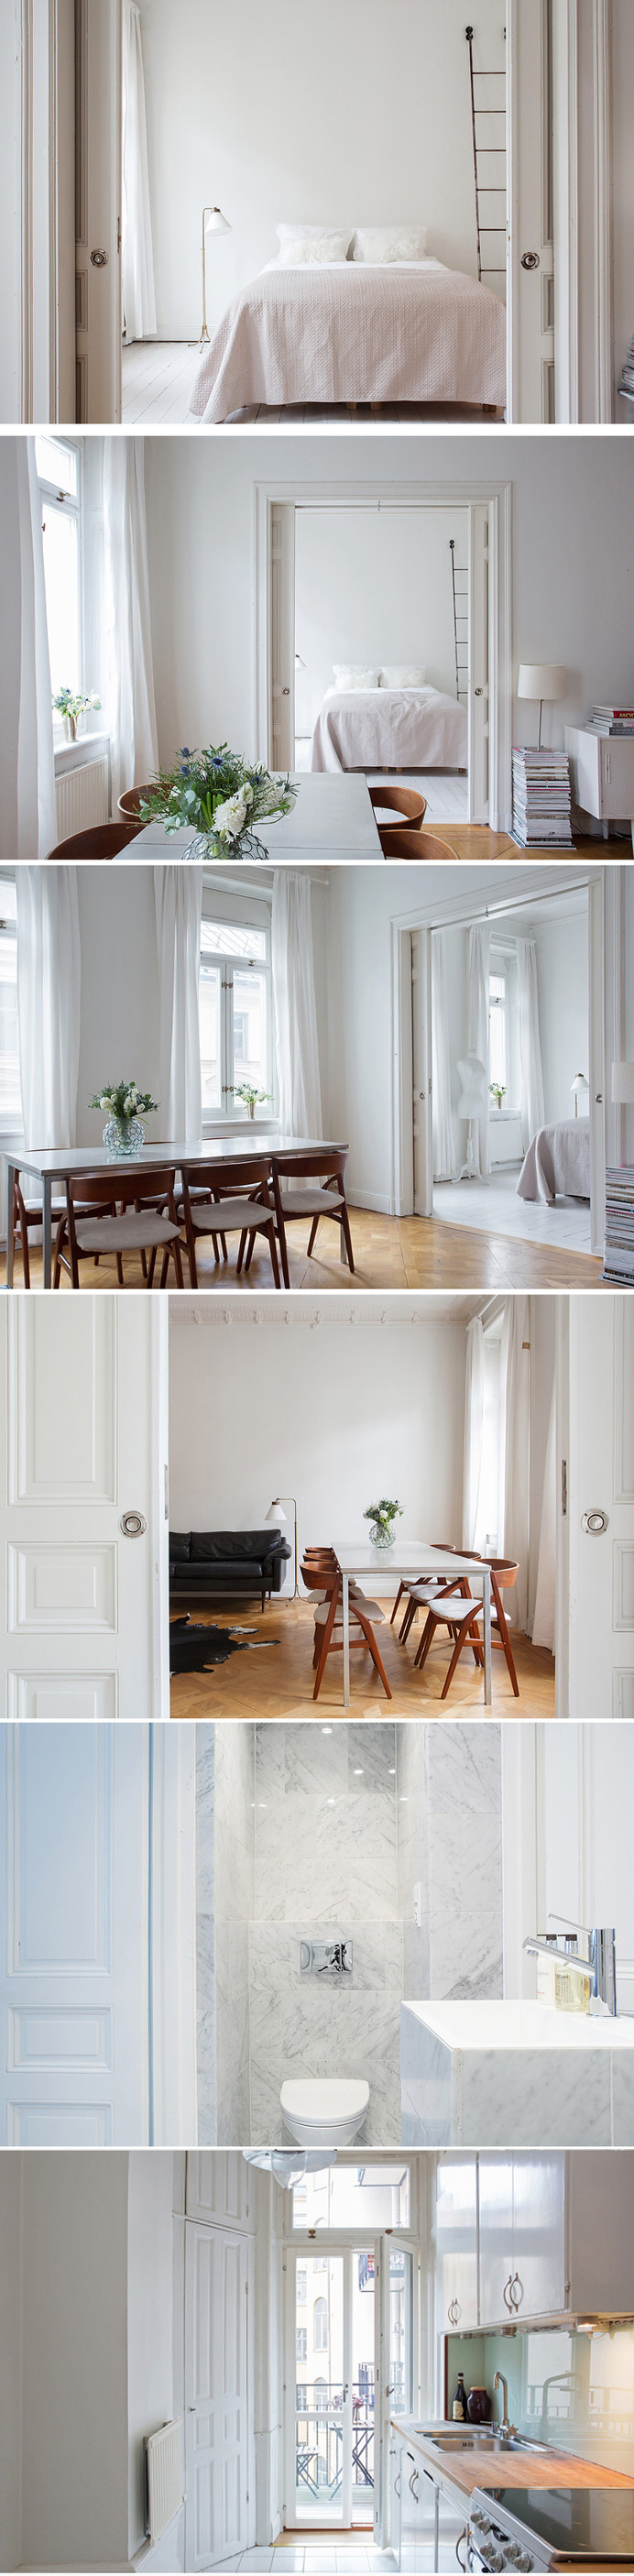 Apartment in Stockholm - Elin